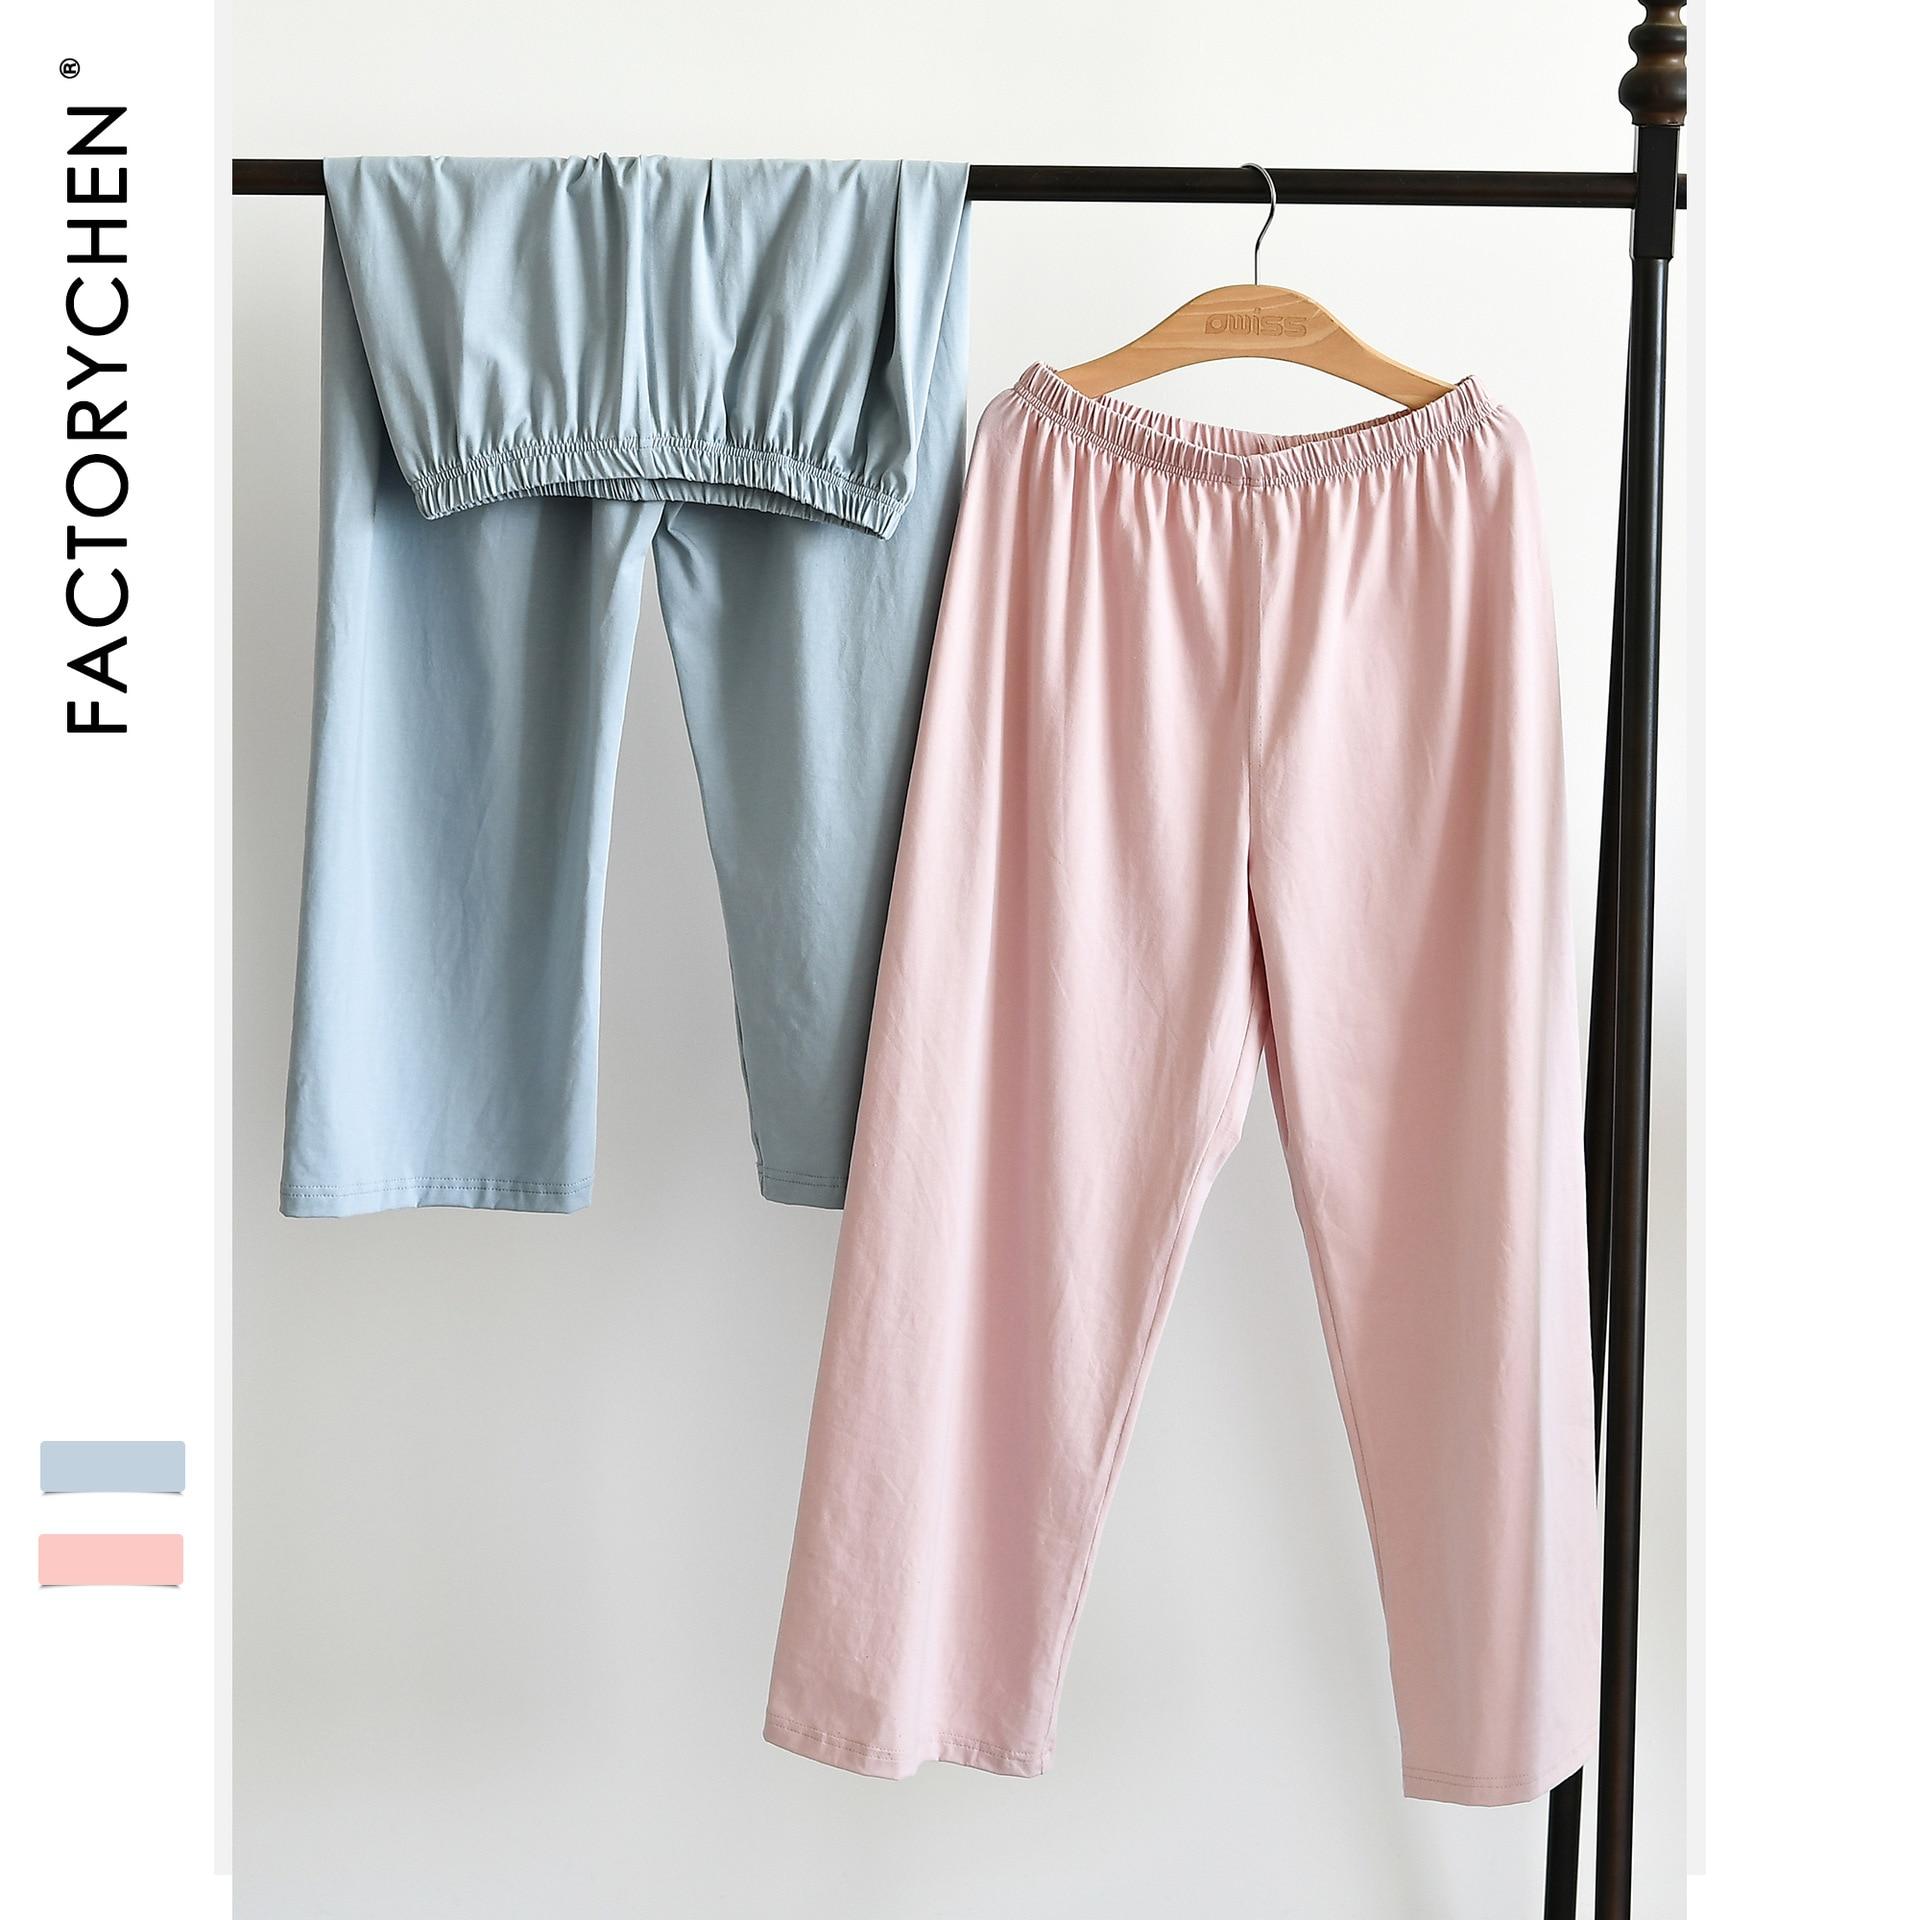 Summer Female Loose Plus Size Sleep Bottoms Comfortable Good Material Elastic Ammonia + Cotton Thin Household Sleepwear Pants